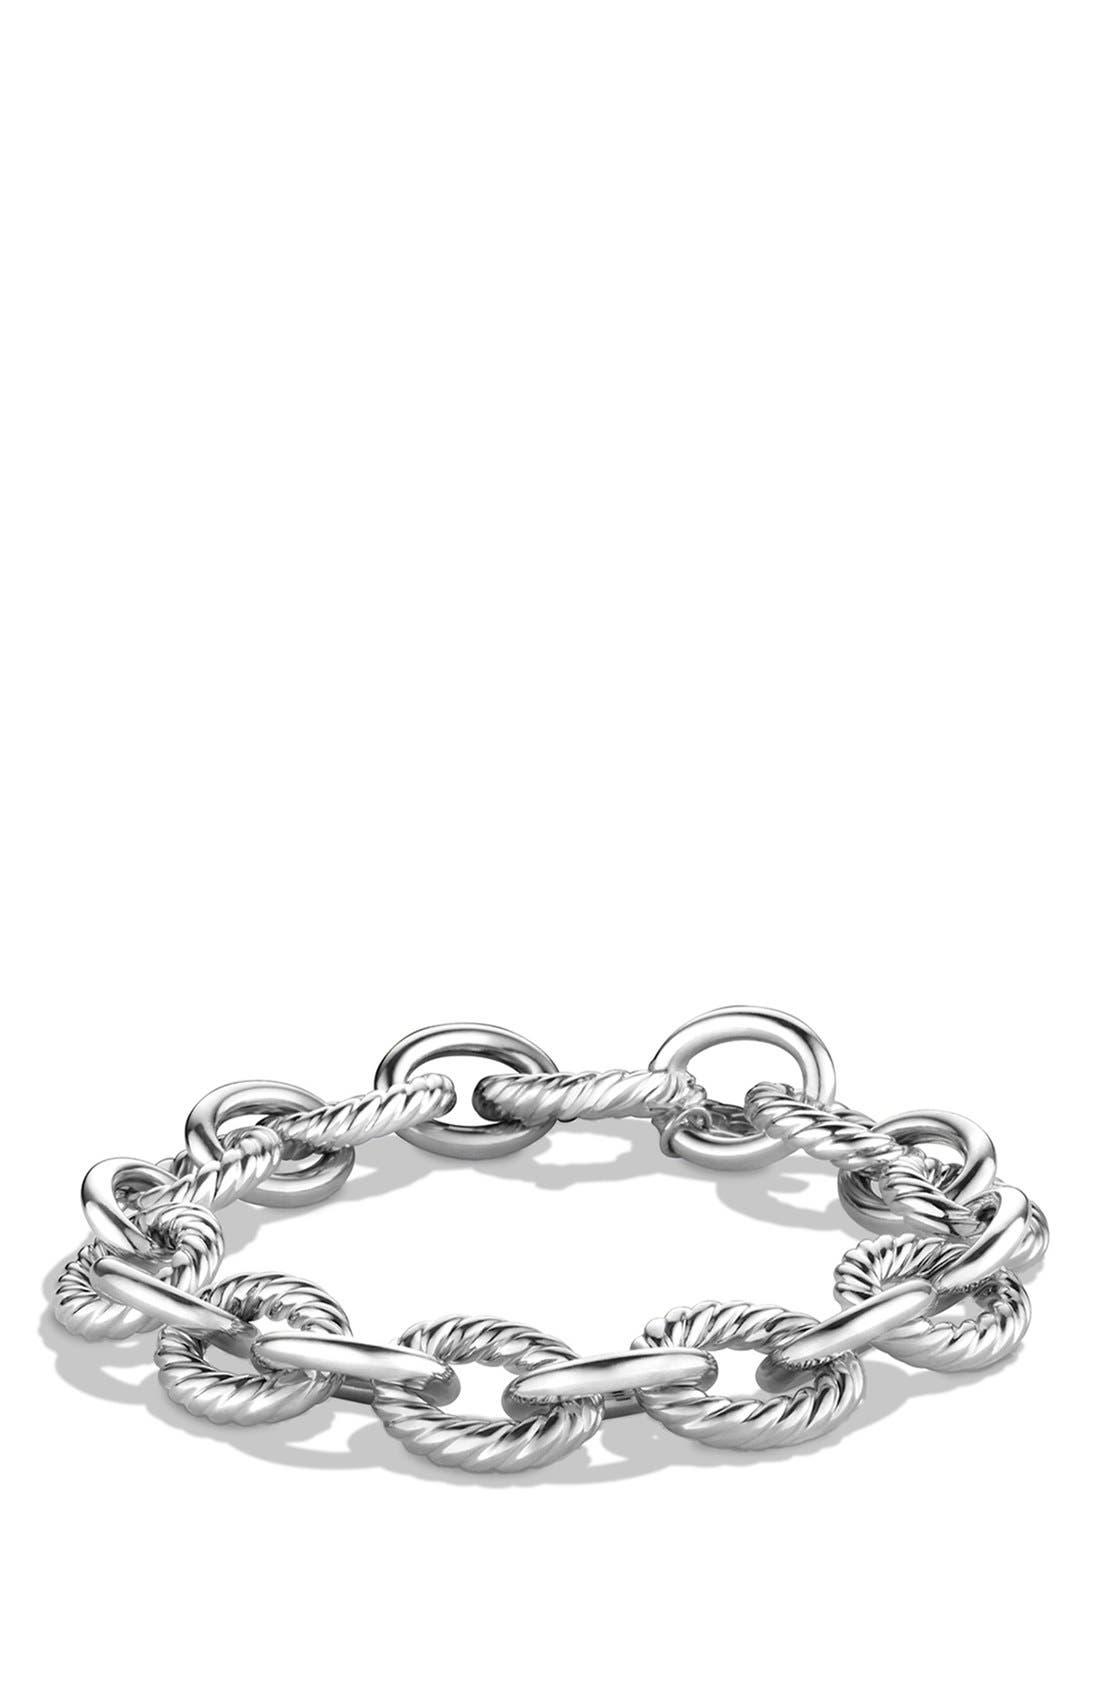 Main Image - David Yurman 'Oval' Large Link Bracelet